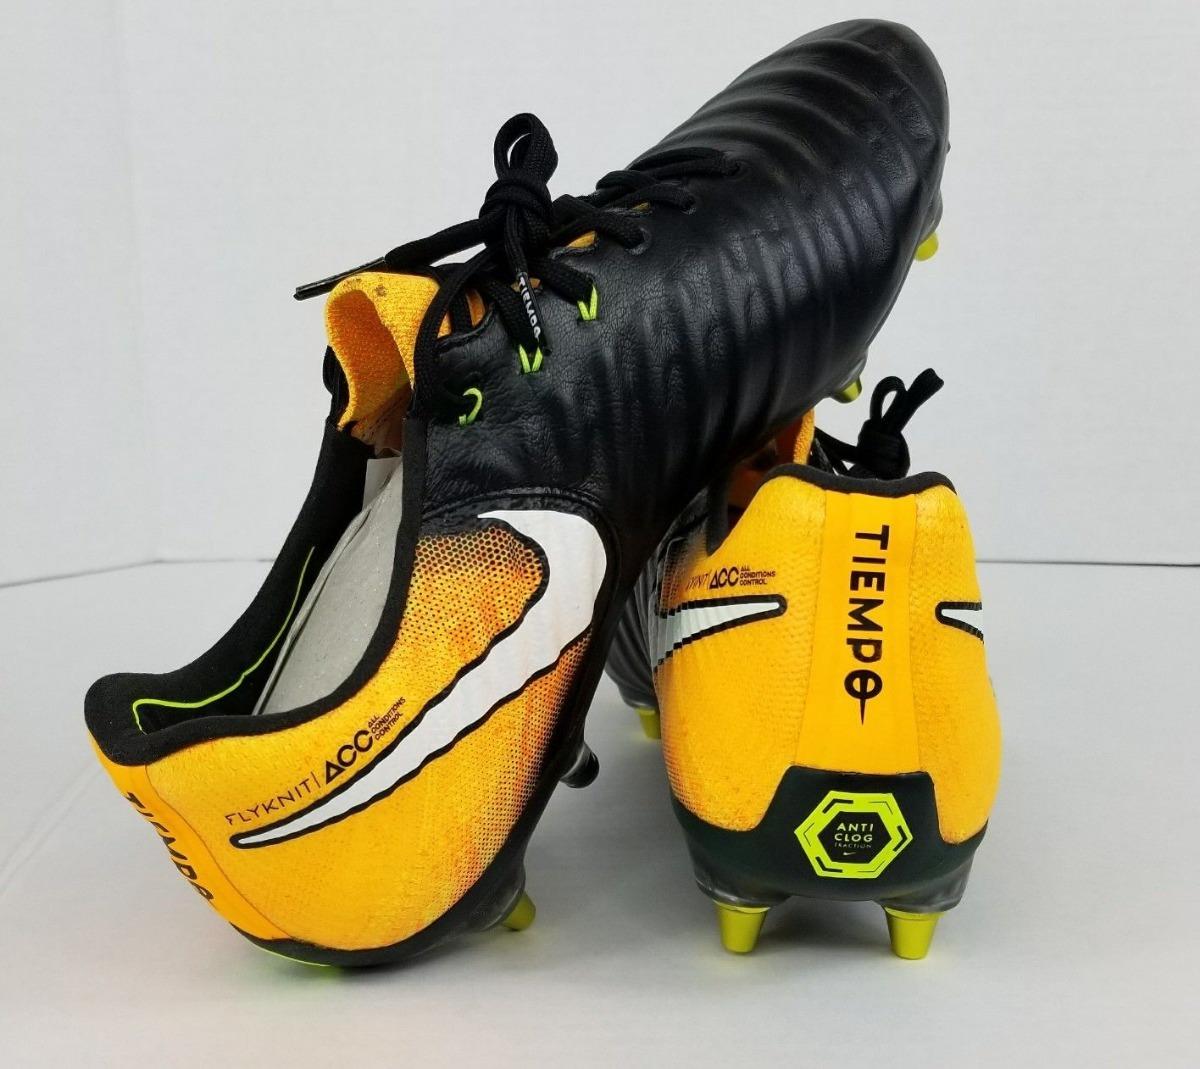 Adidas Fußball Schuhe Rasen Kunstrasen NP 100 Euro